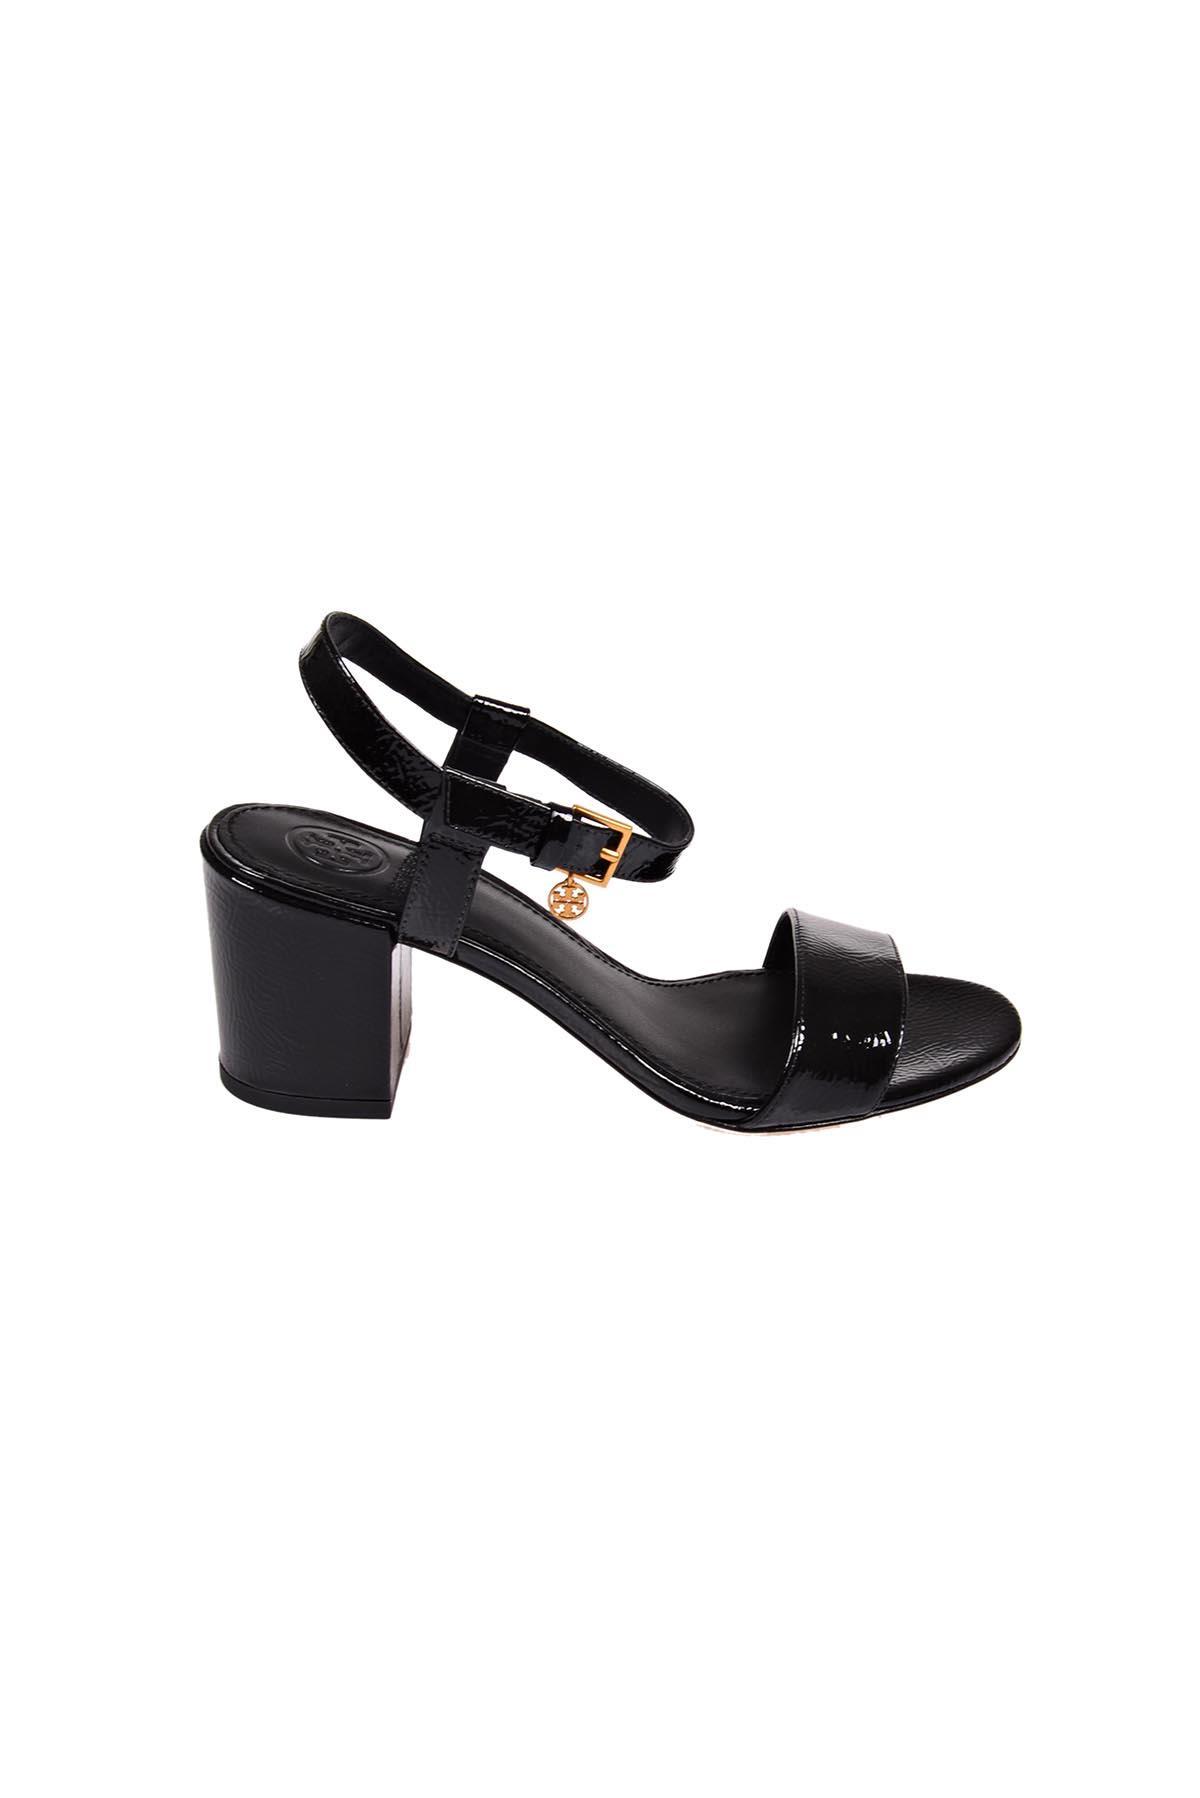 b13cdbbb488 Tory Burch Laurel 65Mm Ankle-Strap Sandal In Black